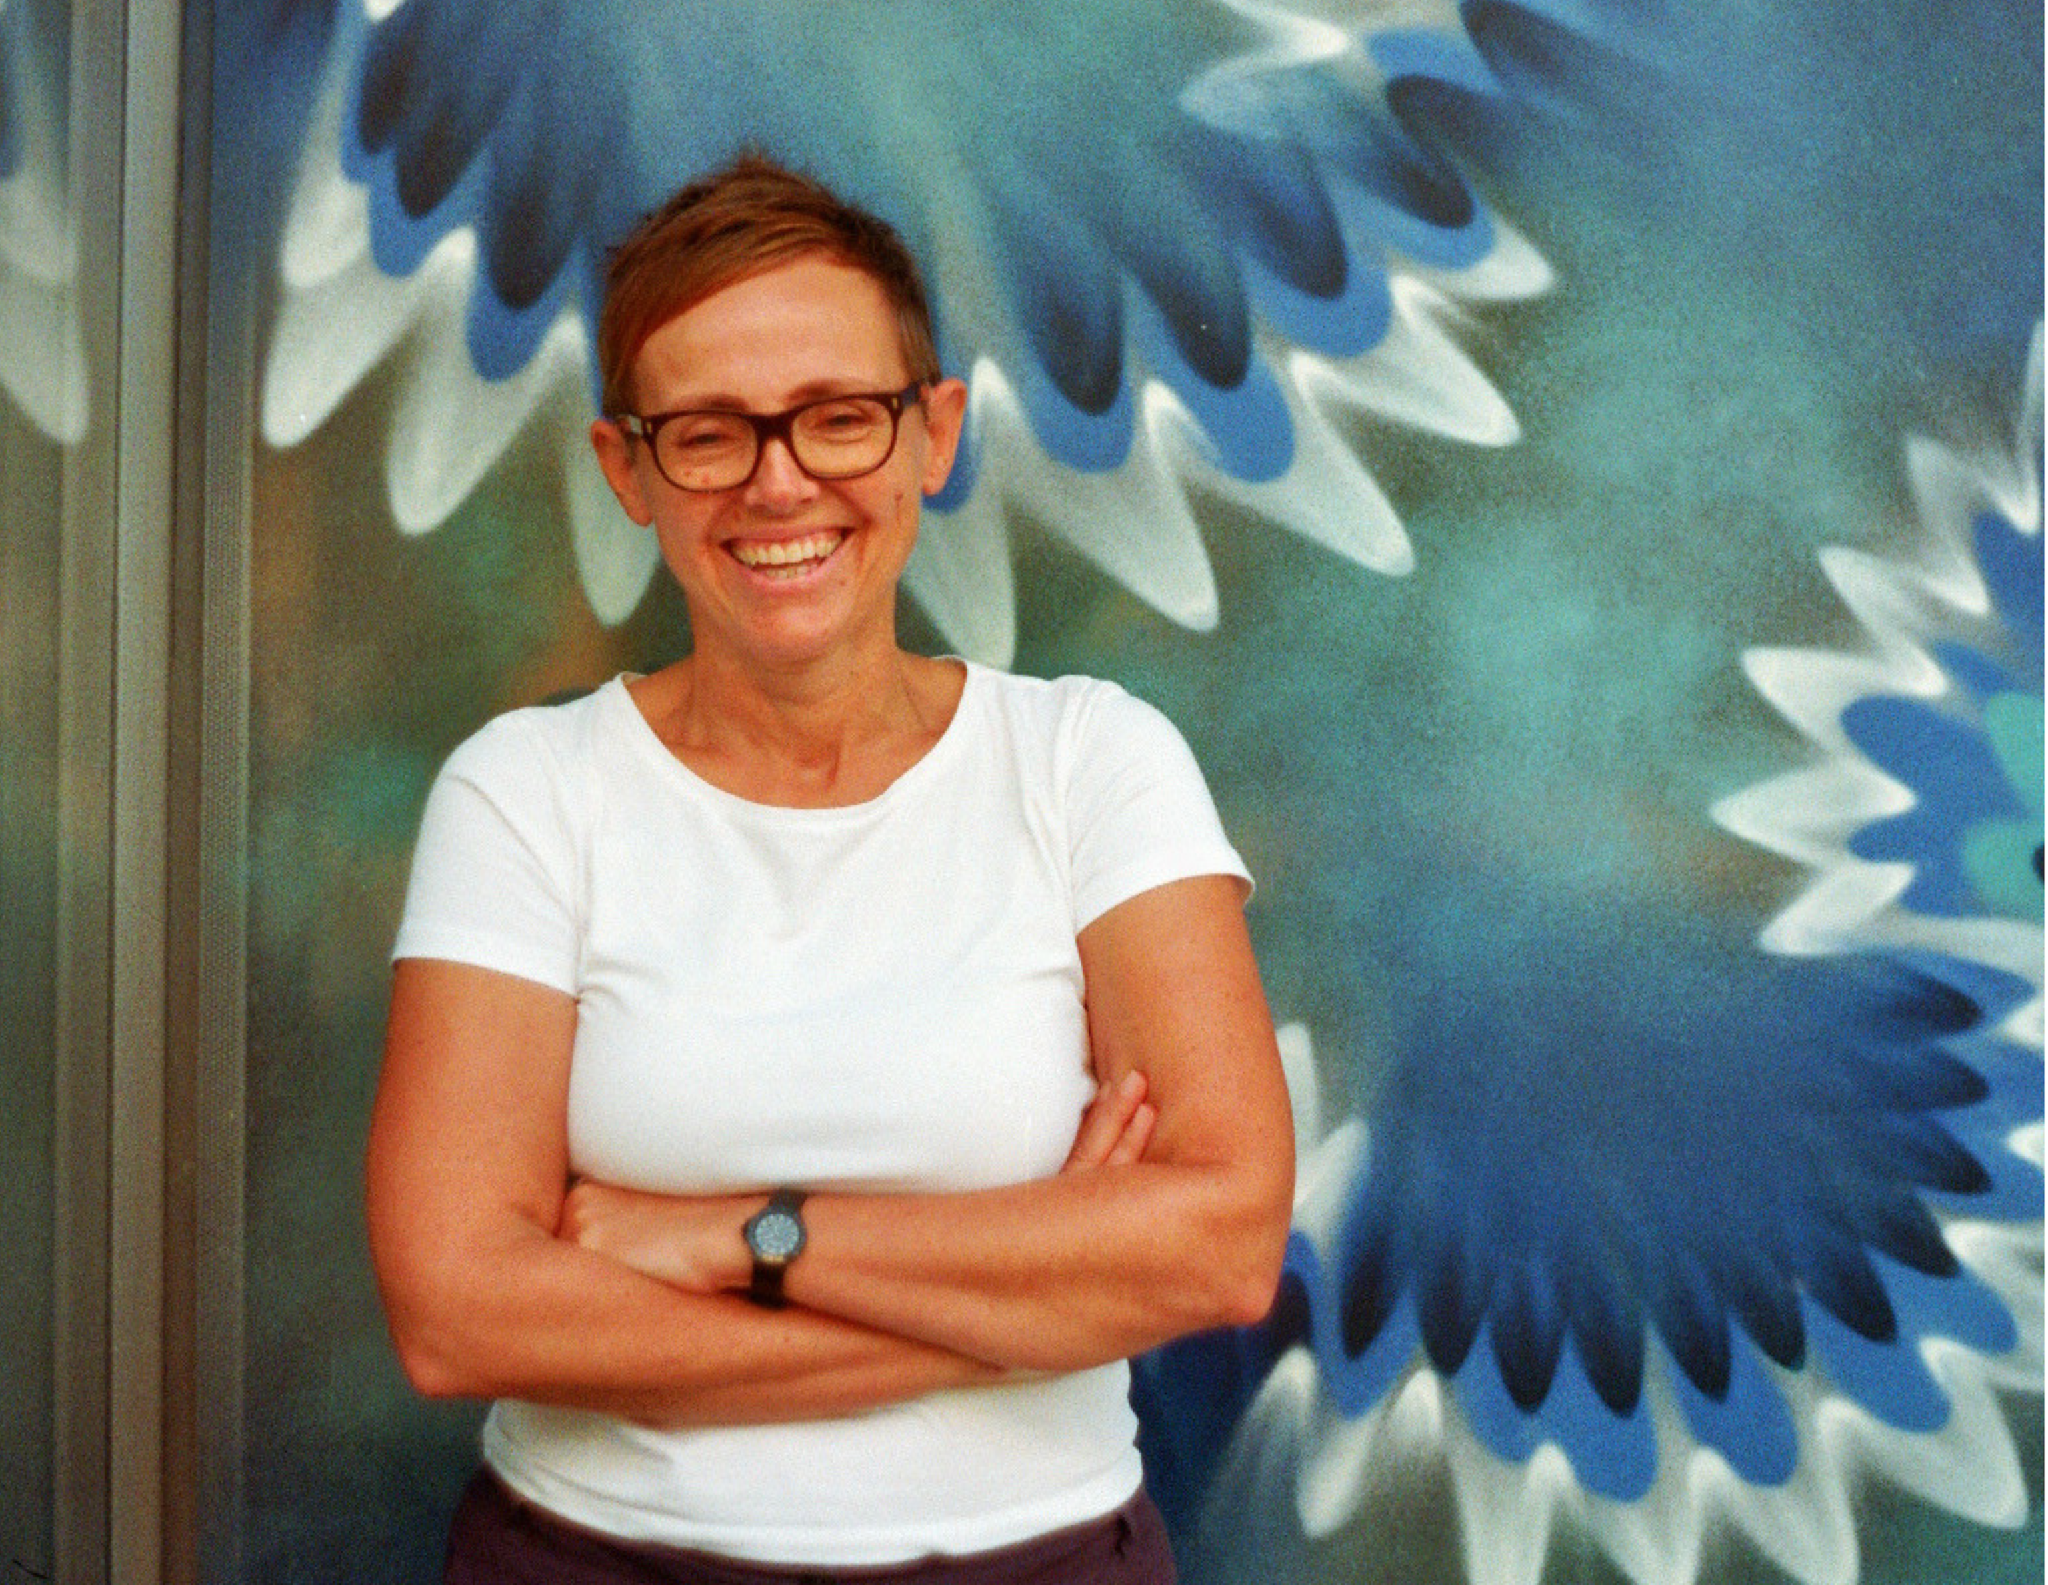 Monika Kräftner